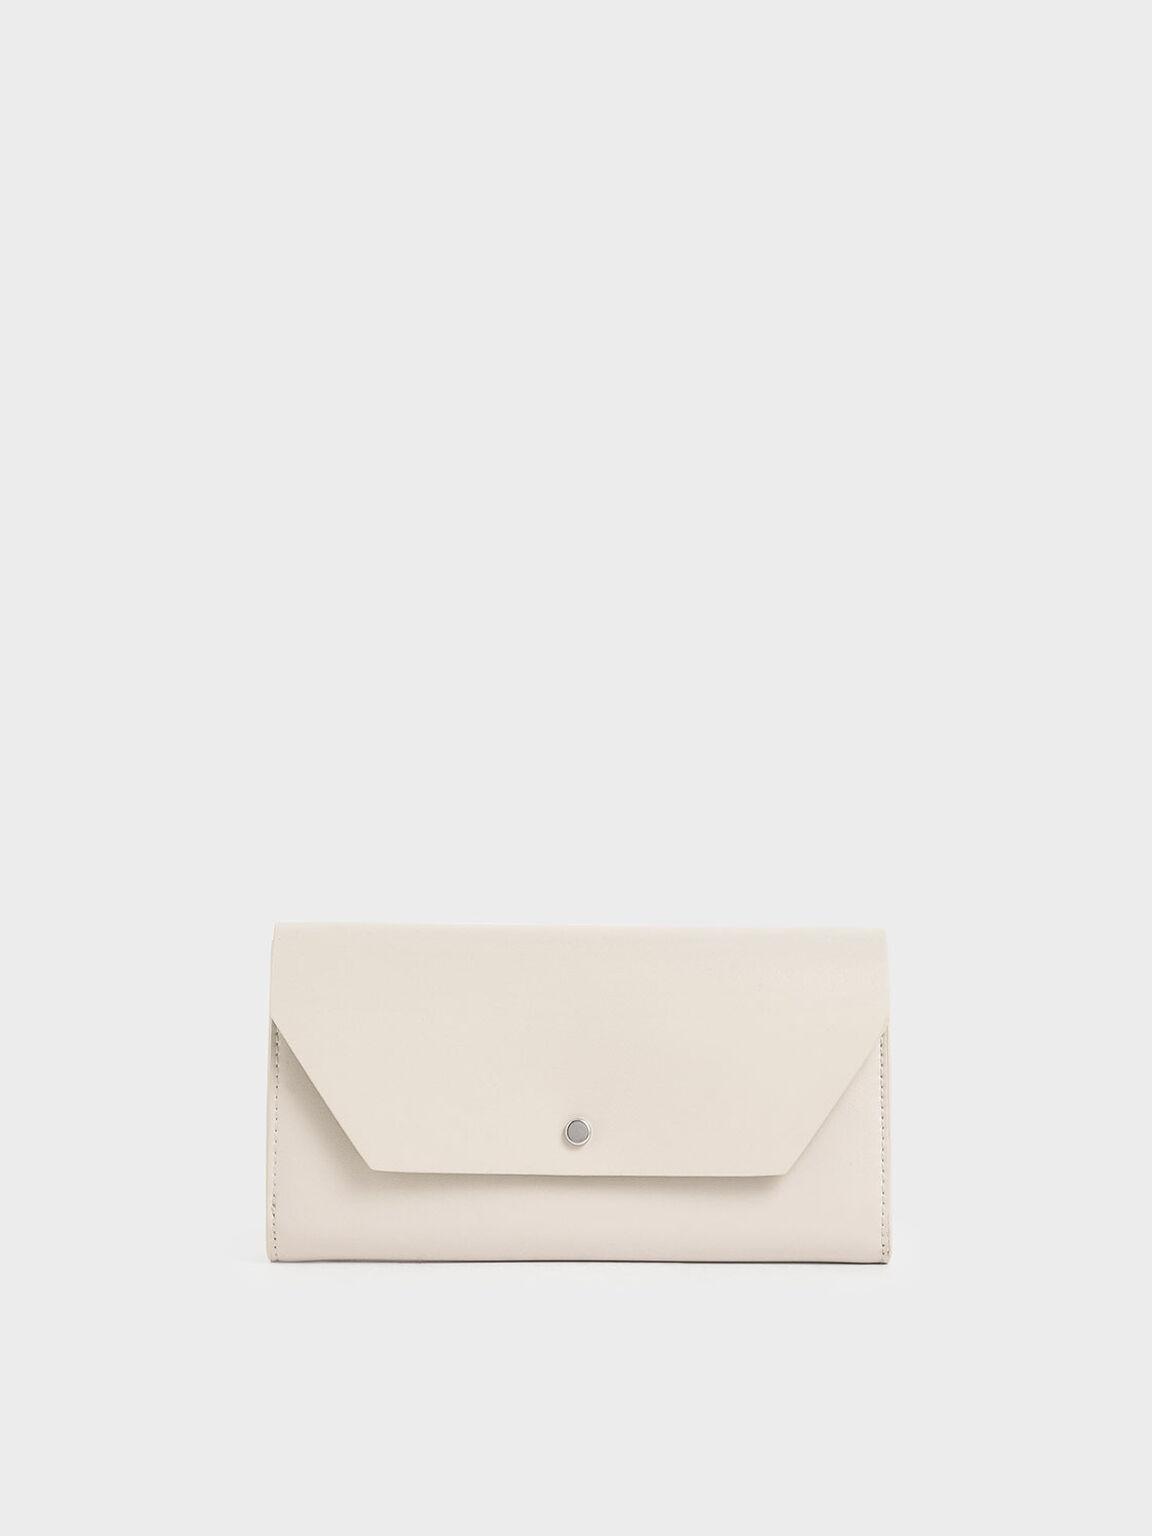 Reversible Front Flap Mini Long Wallet, Cream, hi-res